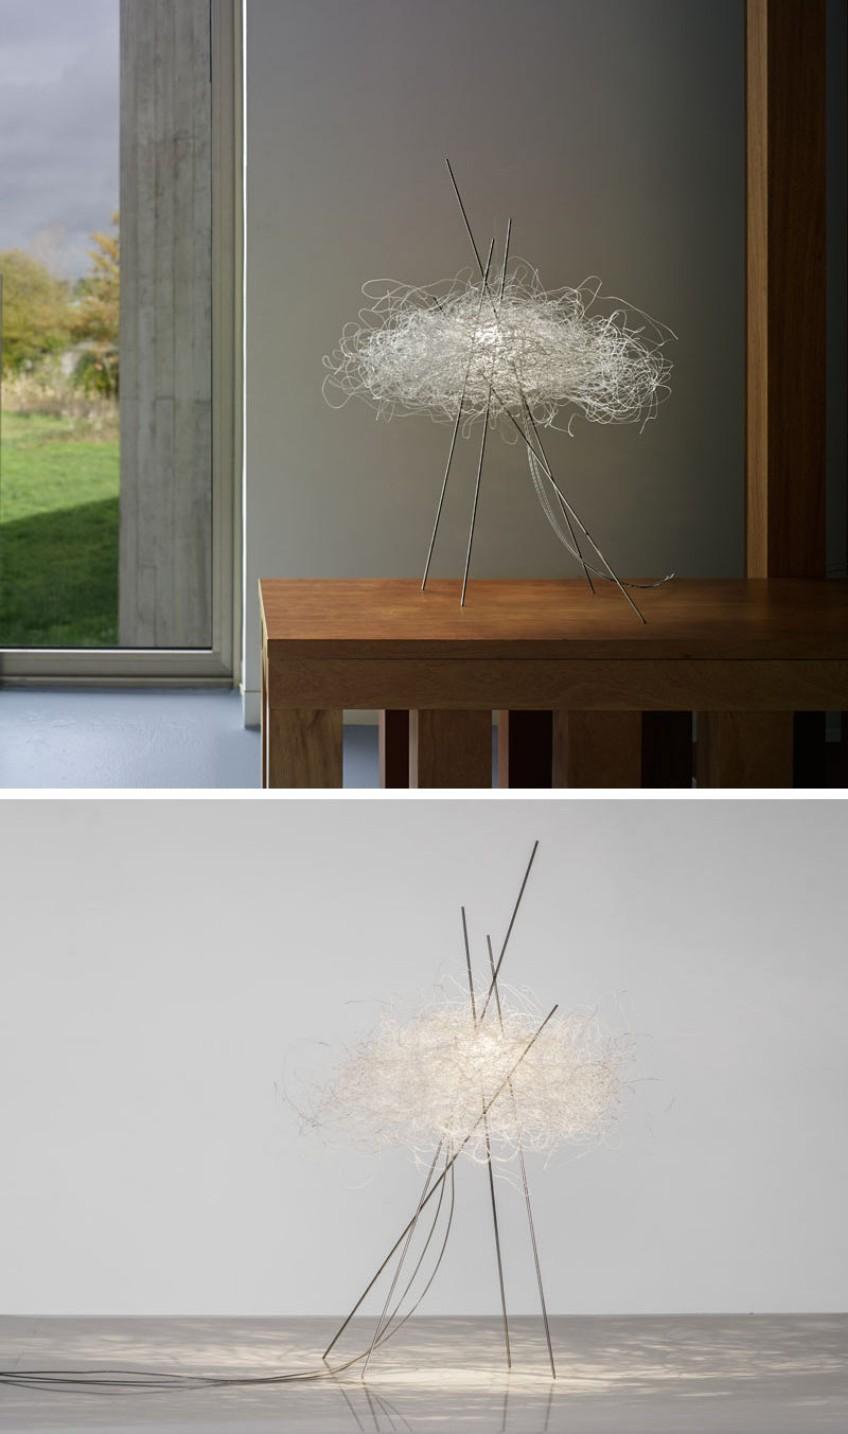 A Modern Cloud-like Decorative Light Fixture light fixture A Modern Cloud-like Decorative Light Fixture A Modern Cloud like Decorative Light Fixture 2